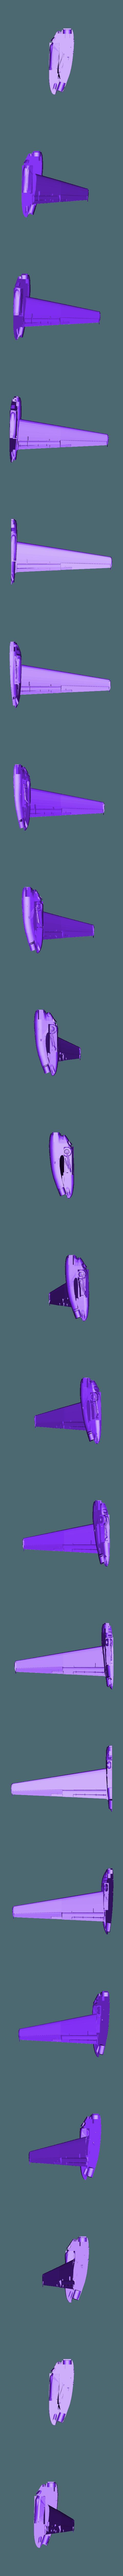 AN-32_wingL1_out.stl Download free STL file Antonov An-32 • Template to 3D print, AVIZO